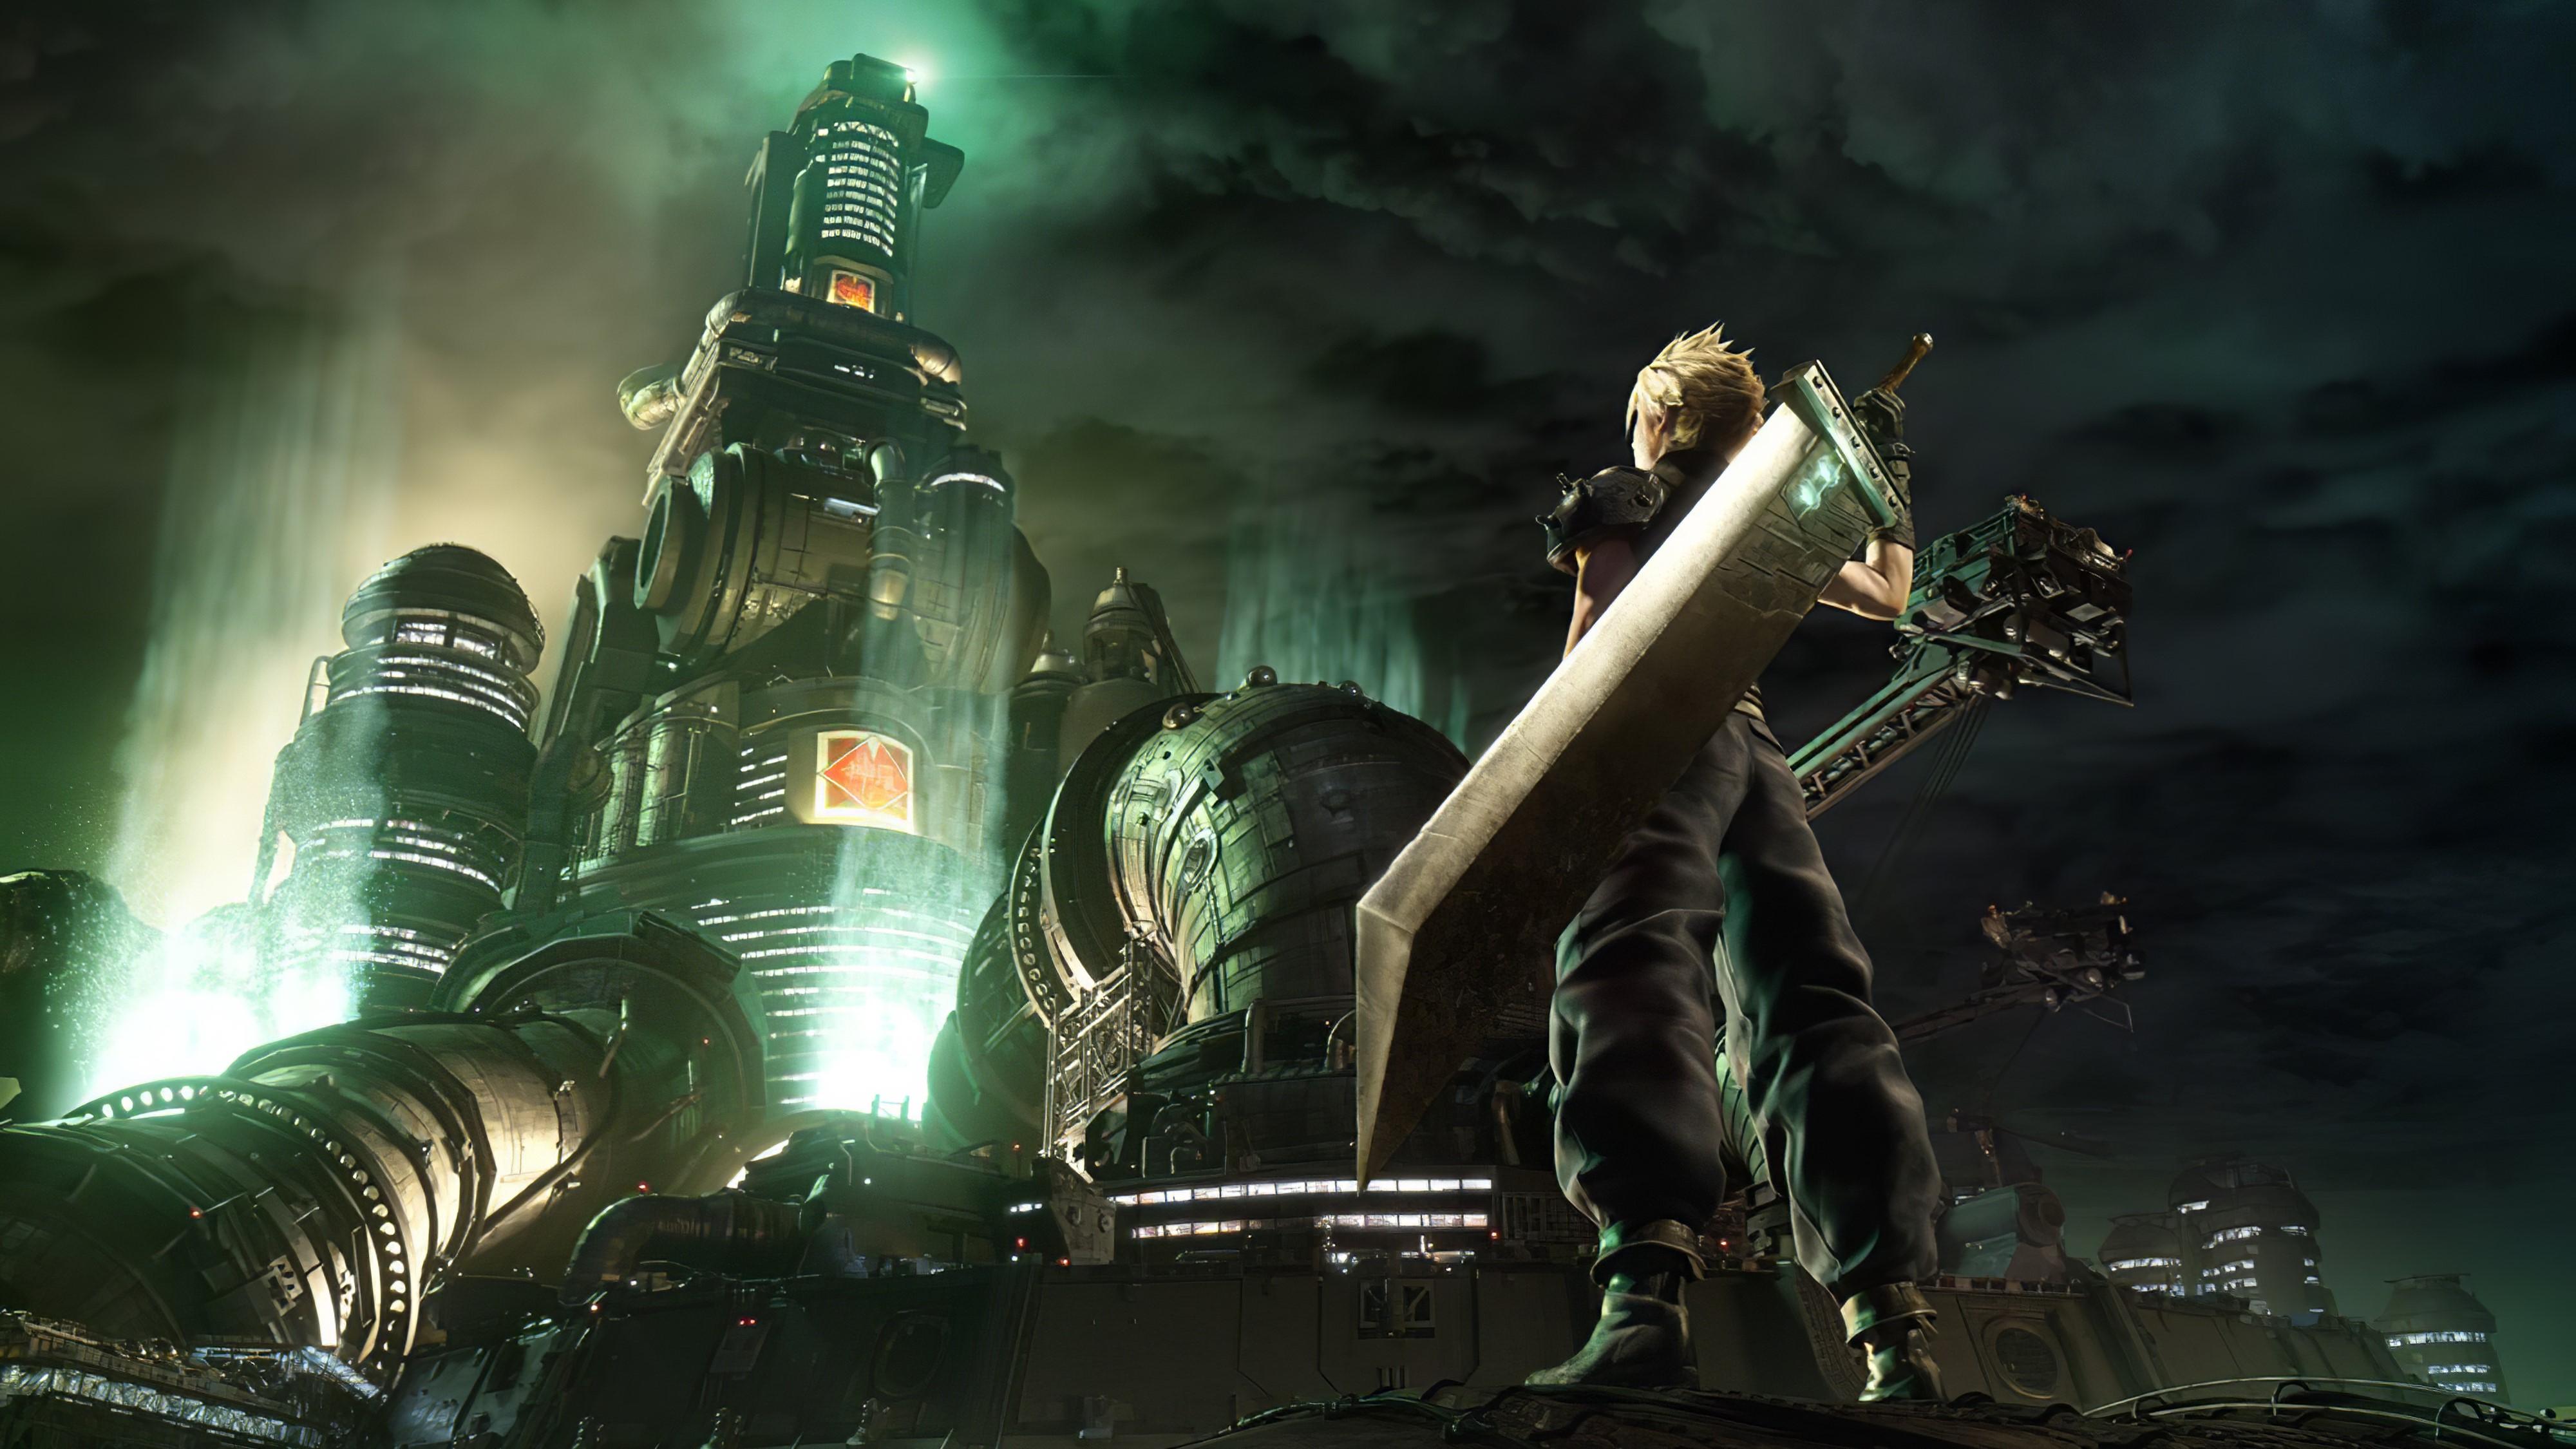 Final Fantasy 7 Remake Wallpaper 4k Posted By Sarah Tremblay